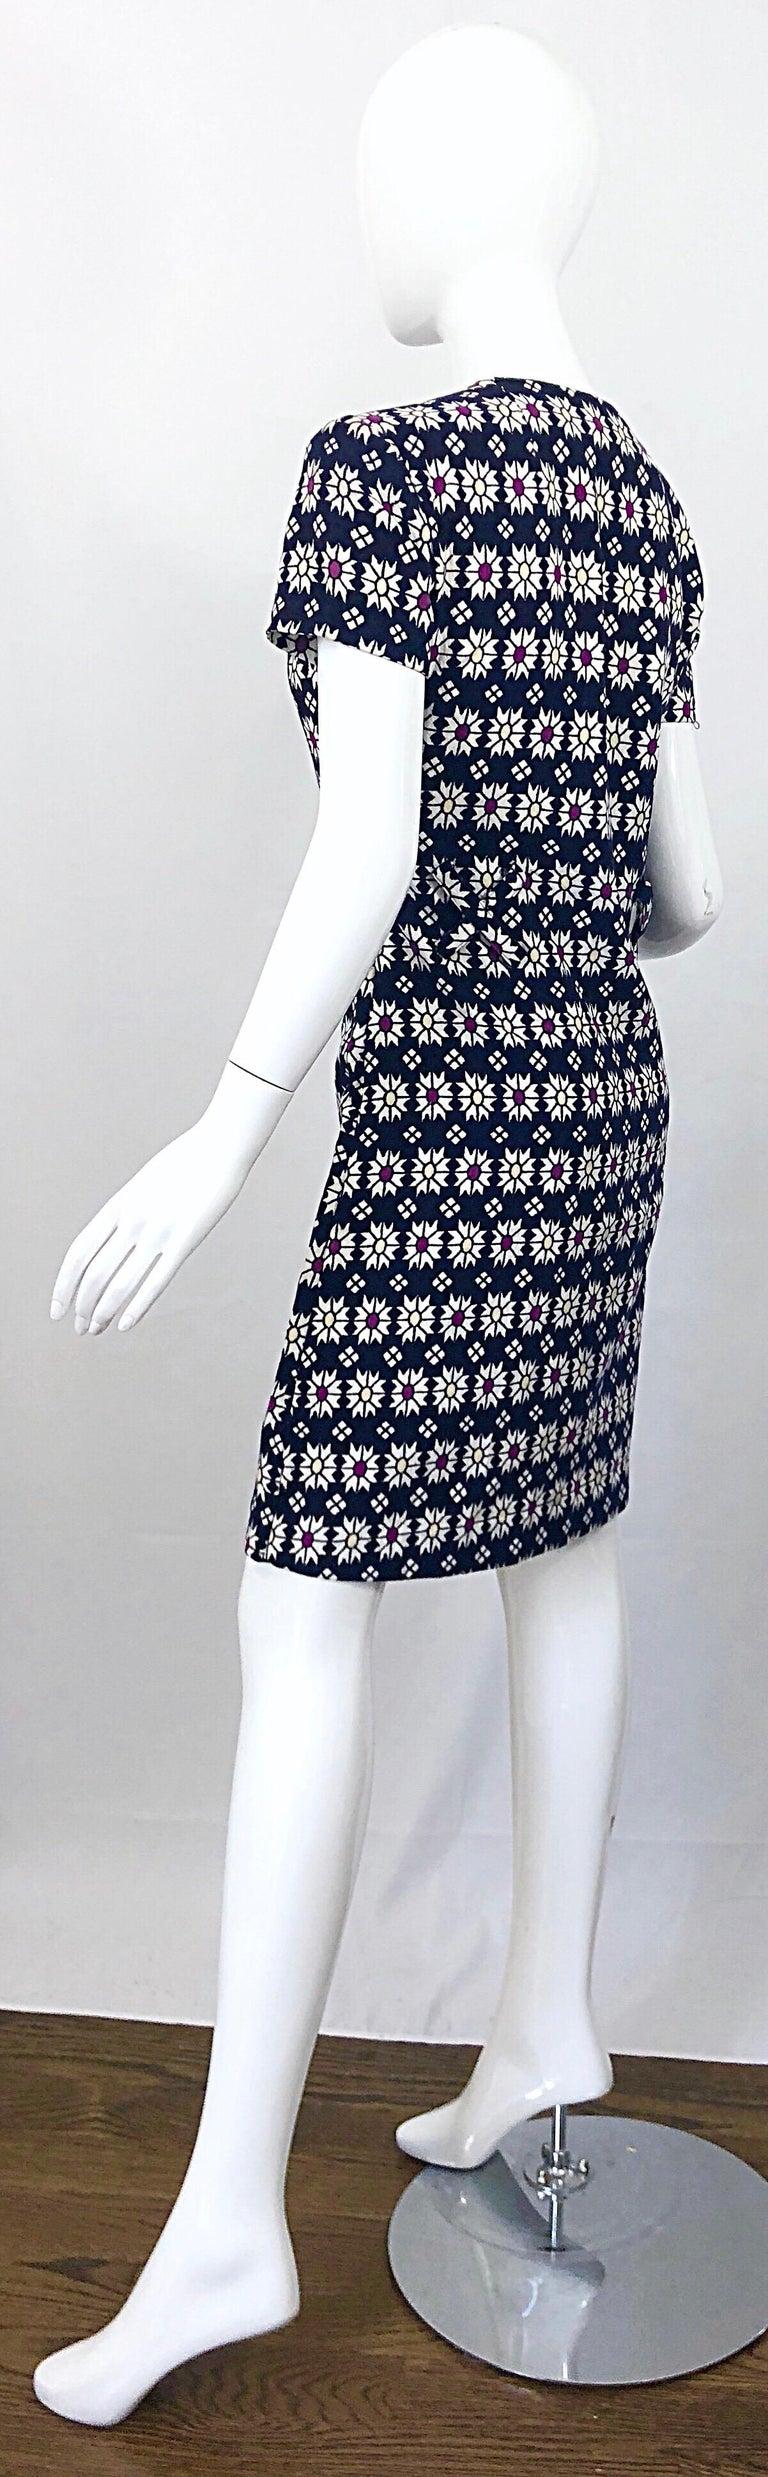 Chic 1960s Navy Blue + Fuchsia + Yellow Geometric Daisy Print 60s A Line Dress For Sale 7